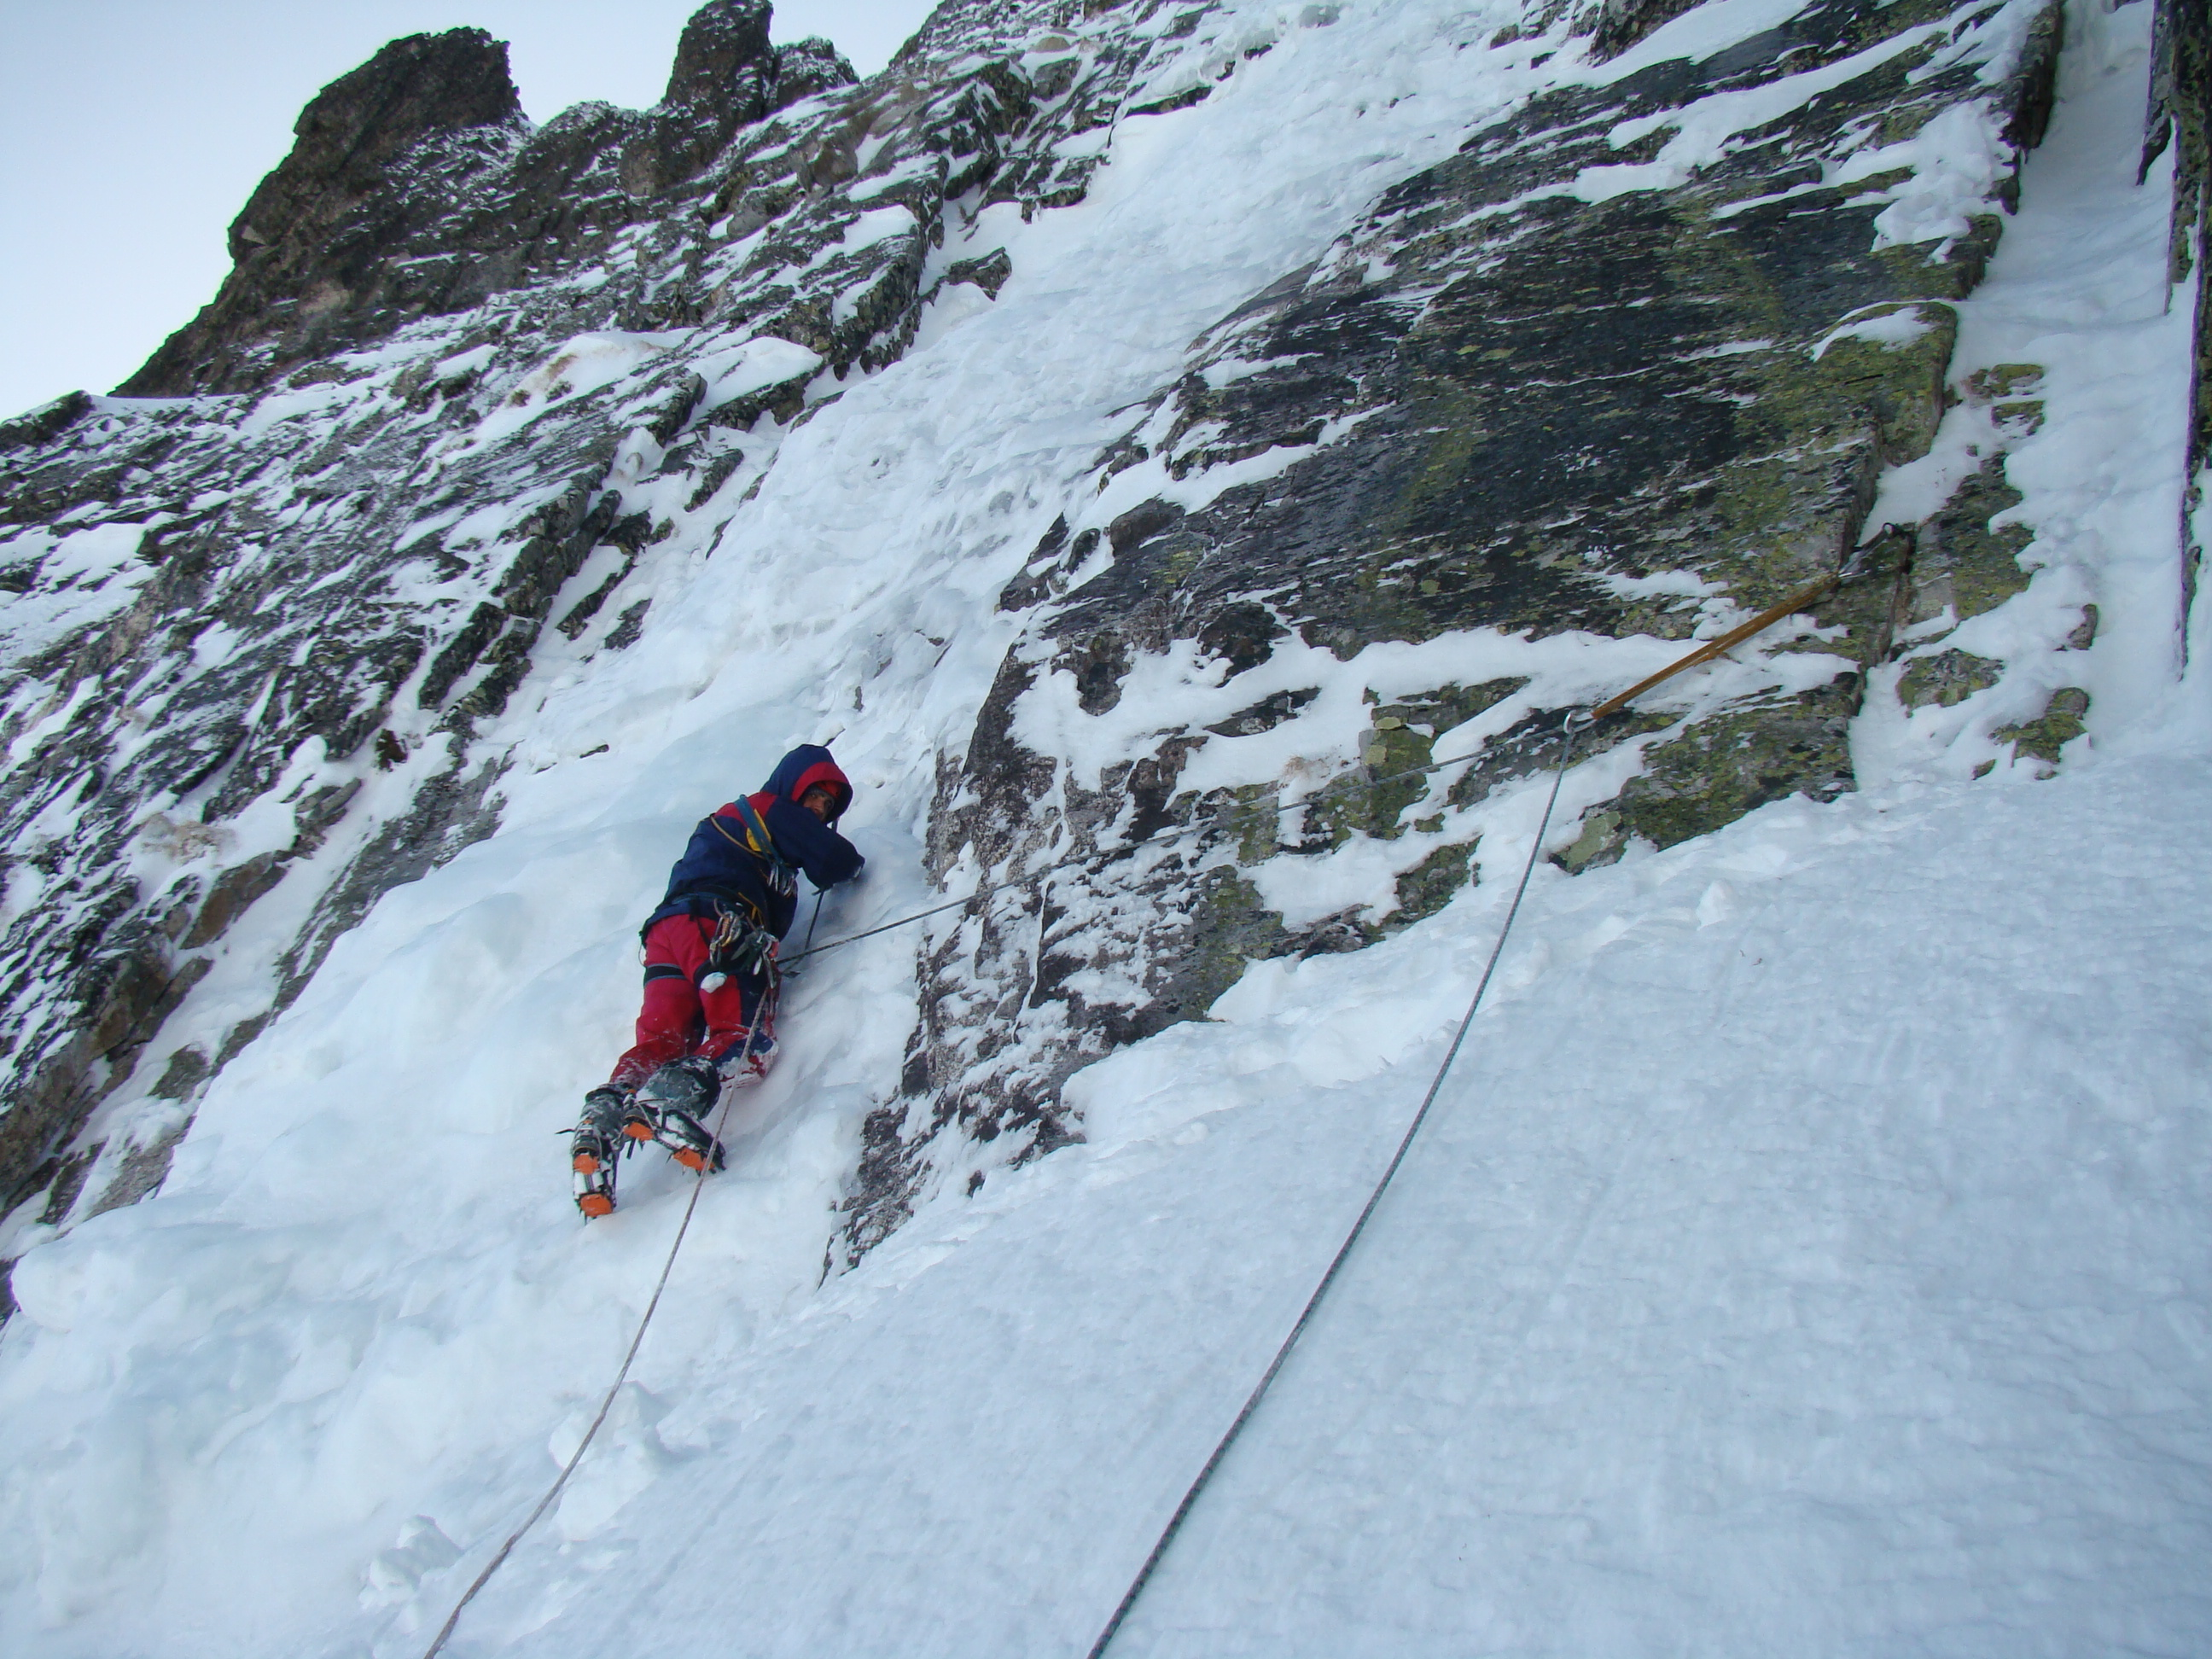 Ice climbing at Mt.Kamilata, Rila